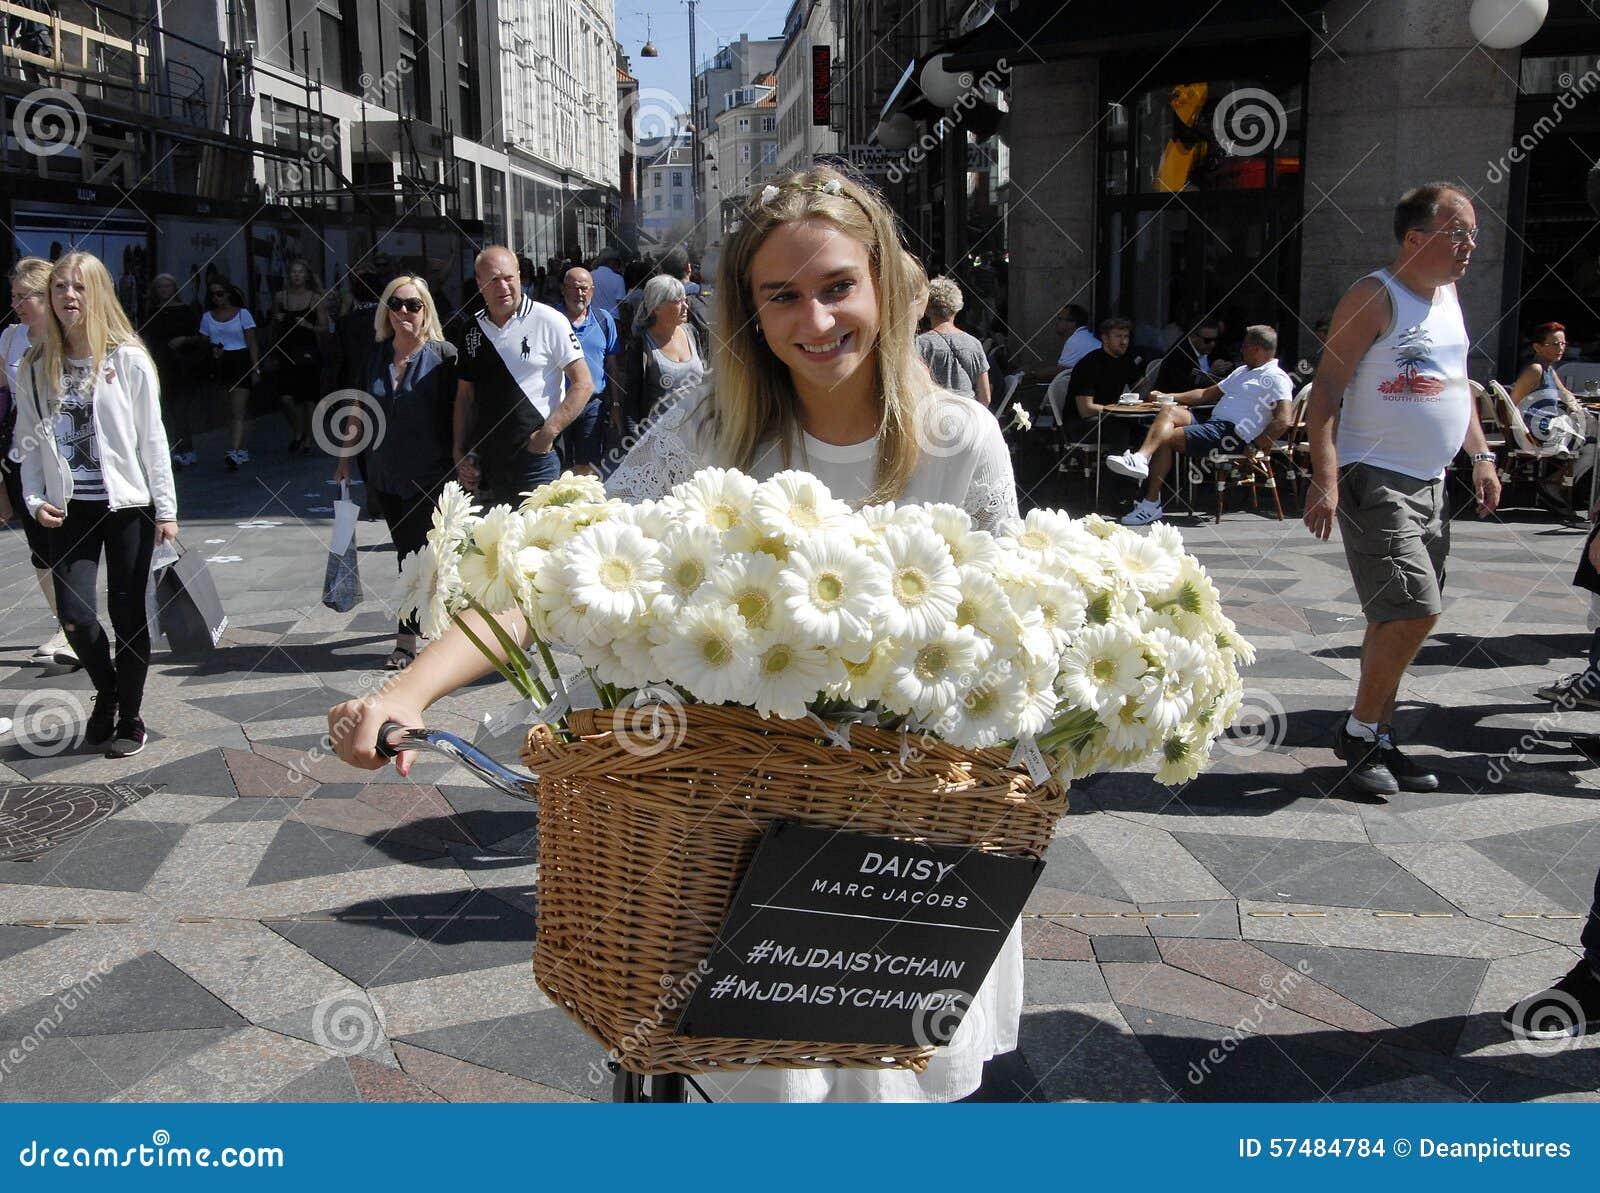 Daisy perfume by marc jacobs editorial stock image image of daisy perfume by marc jacobs kobenhavn copenhagen izmirmasajfo Images